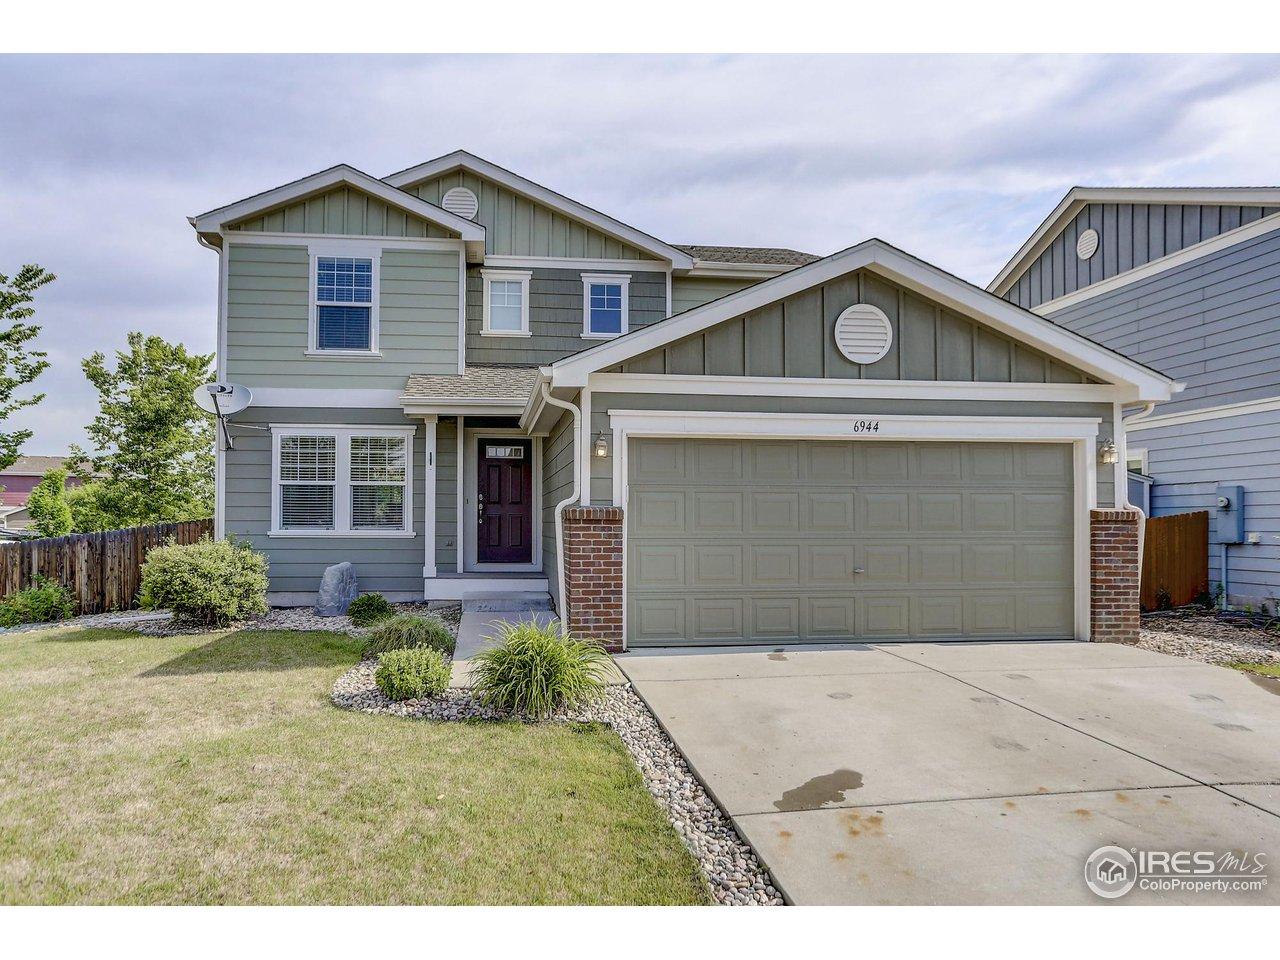 6944 Rosemont Ct, Fort Collins CO 80525